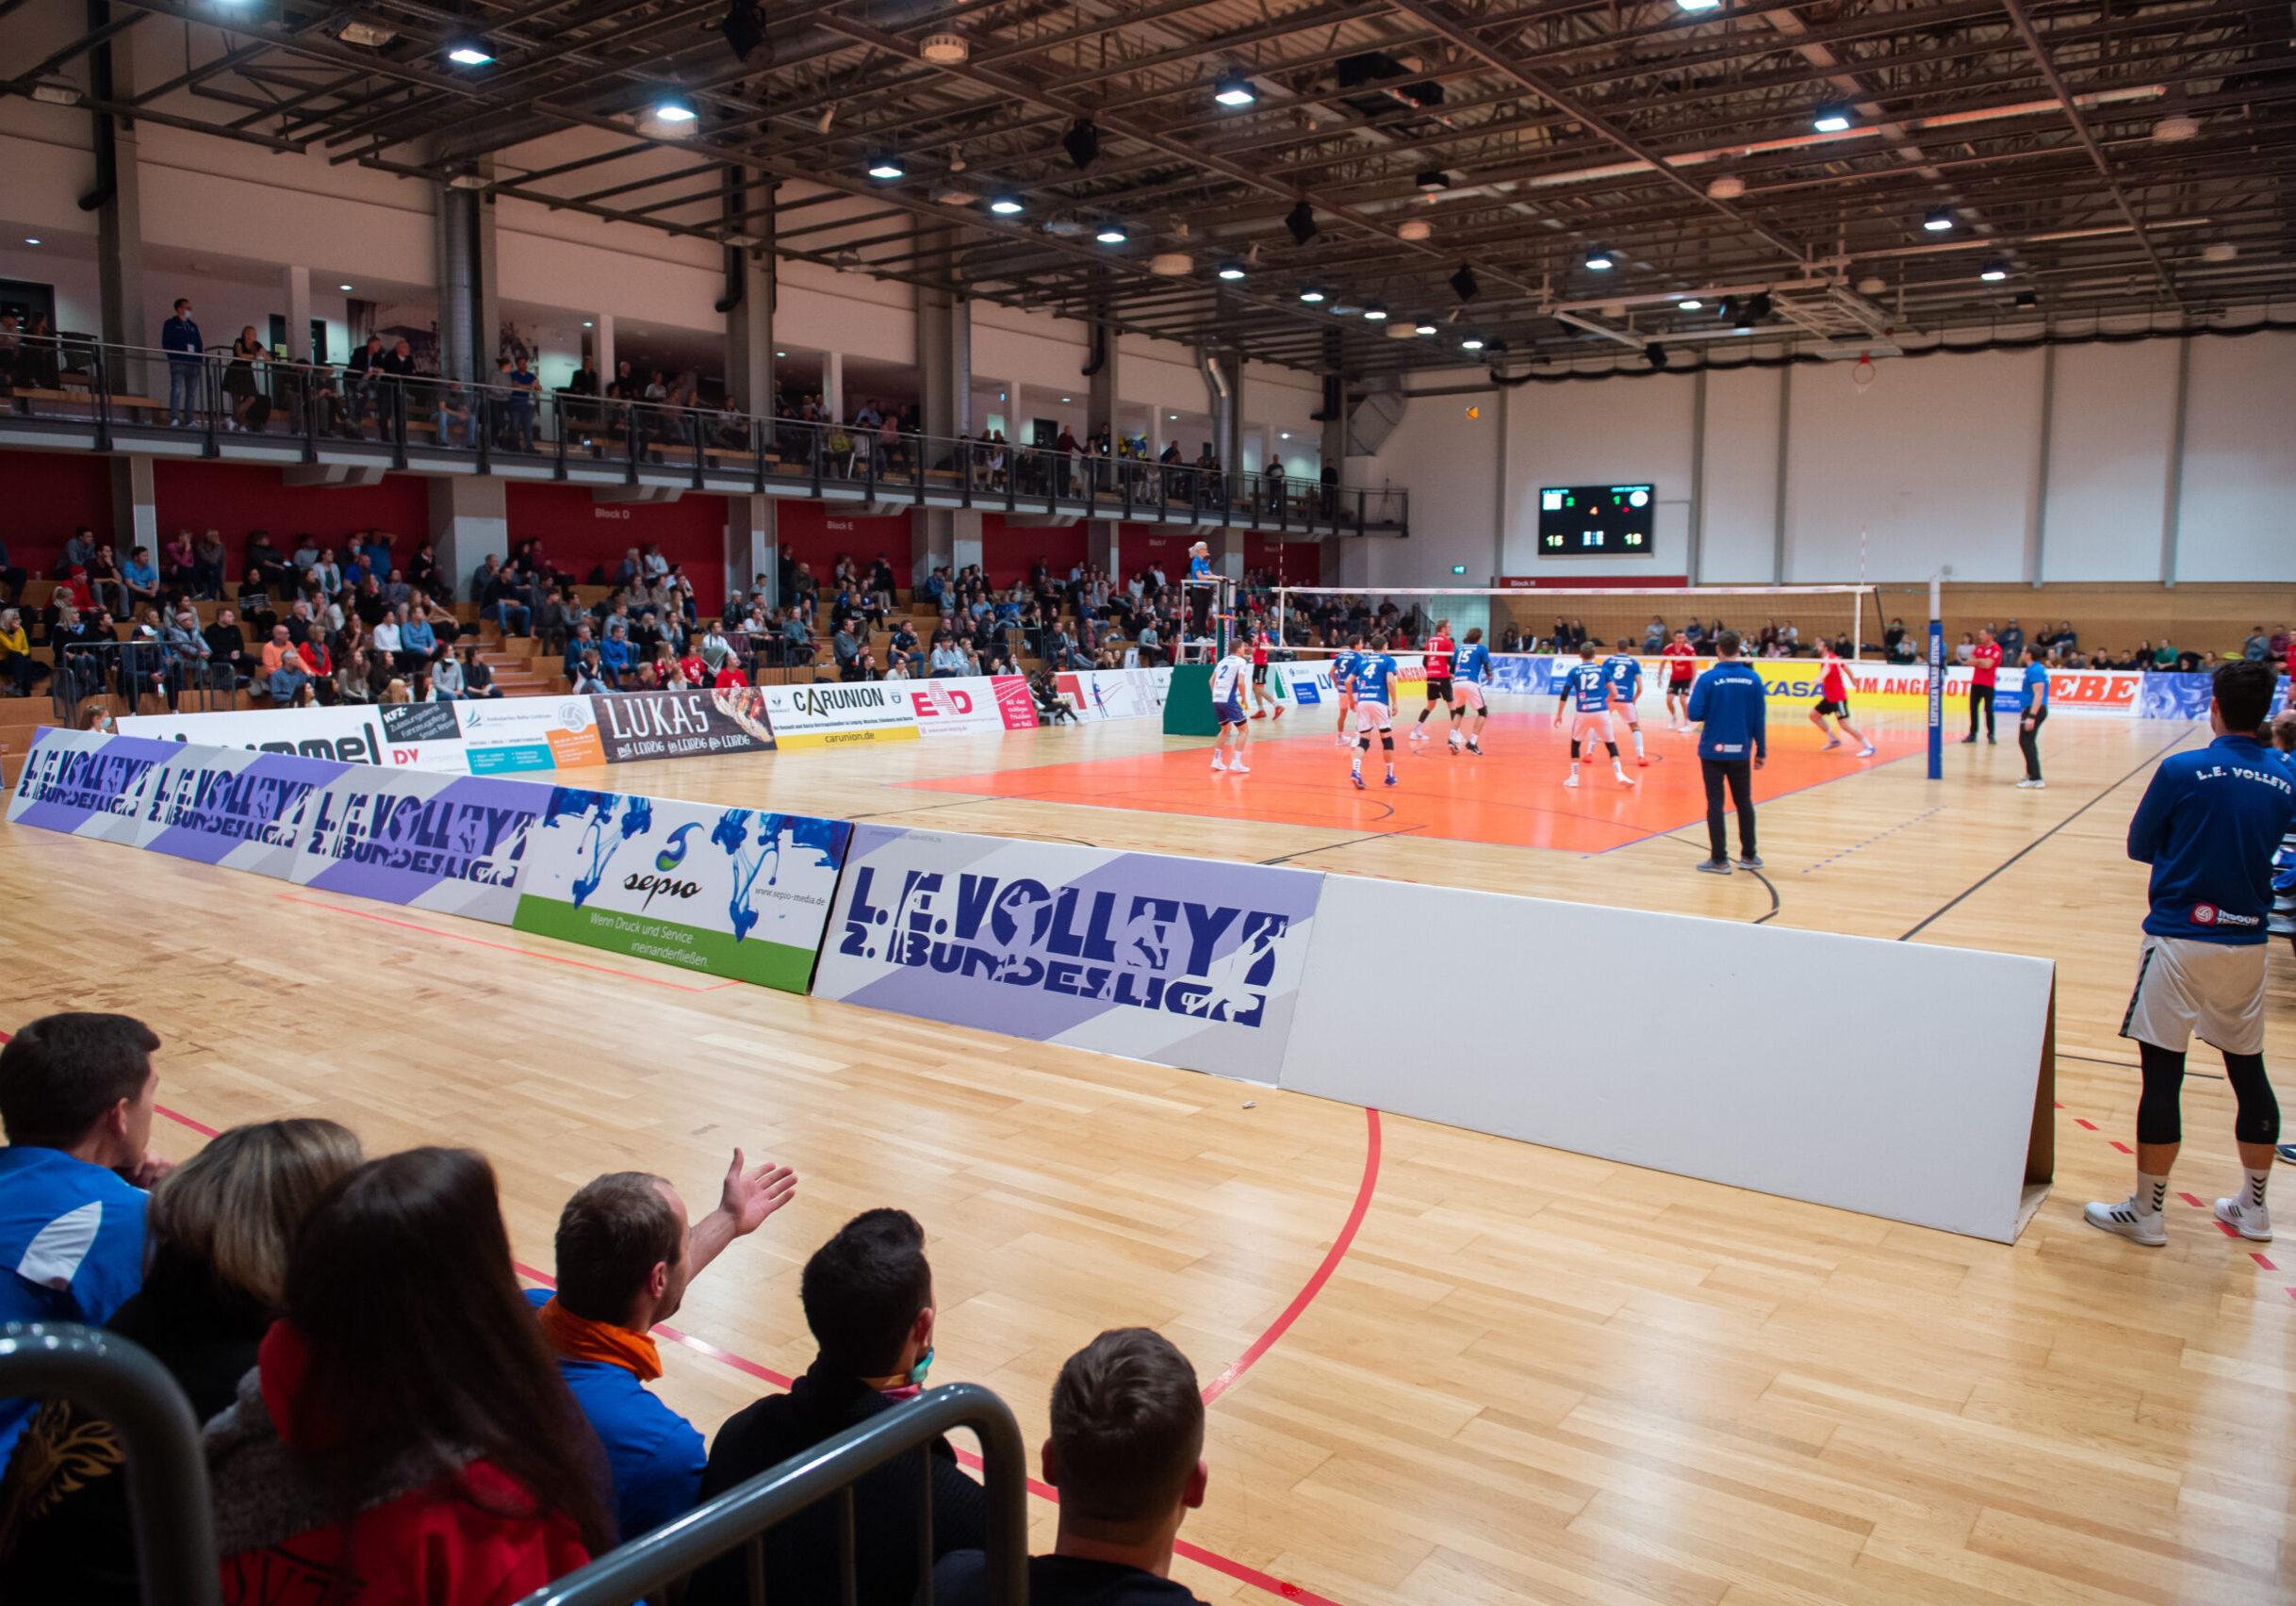 Blick in die HalleSpiel L.E. Volleys Leipzig vs GSVE Delitzsch, Volleyball, 2.Liga, 17.10.2020